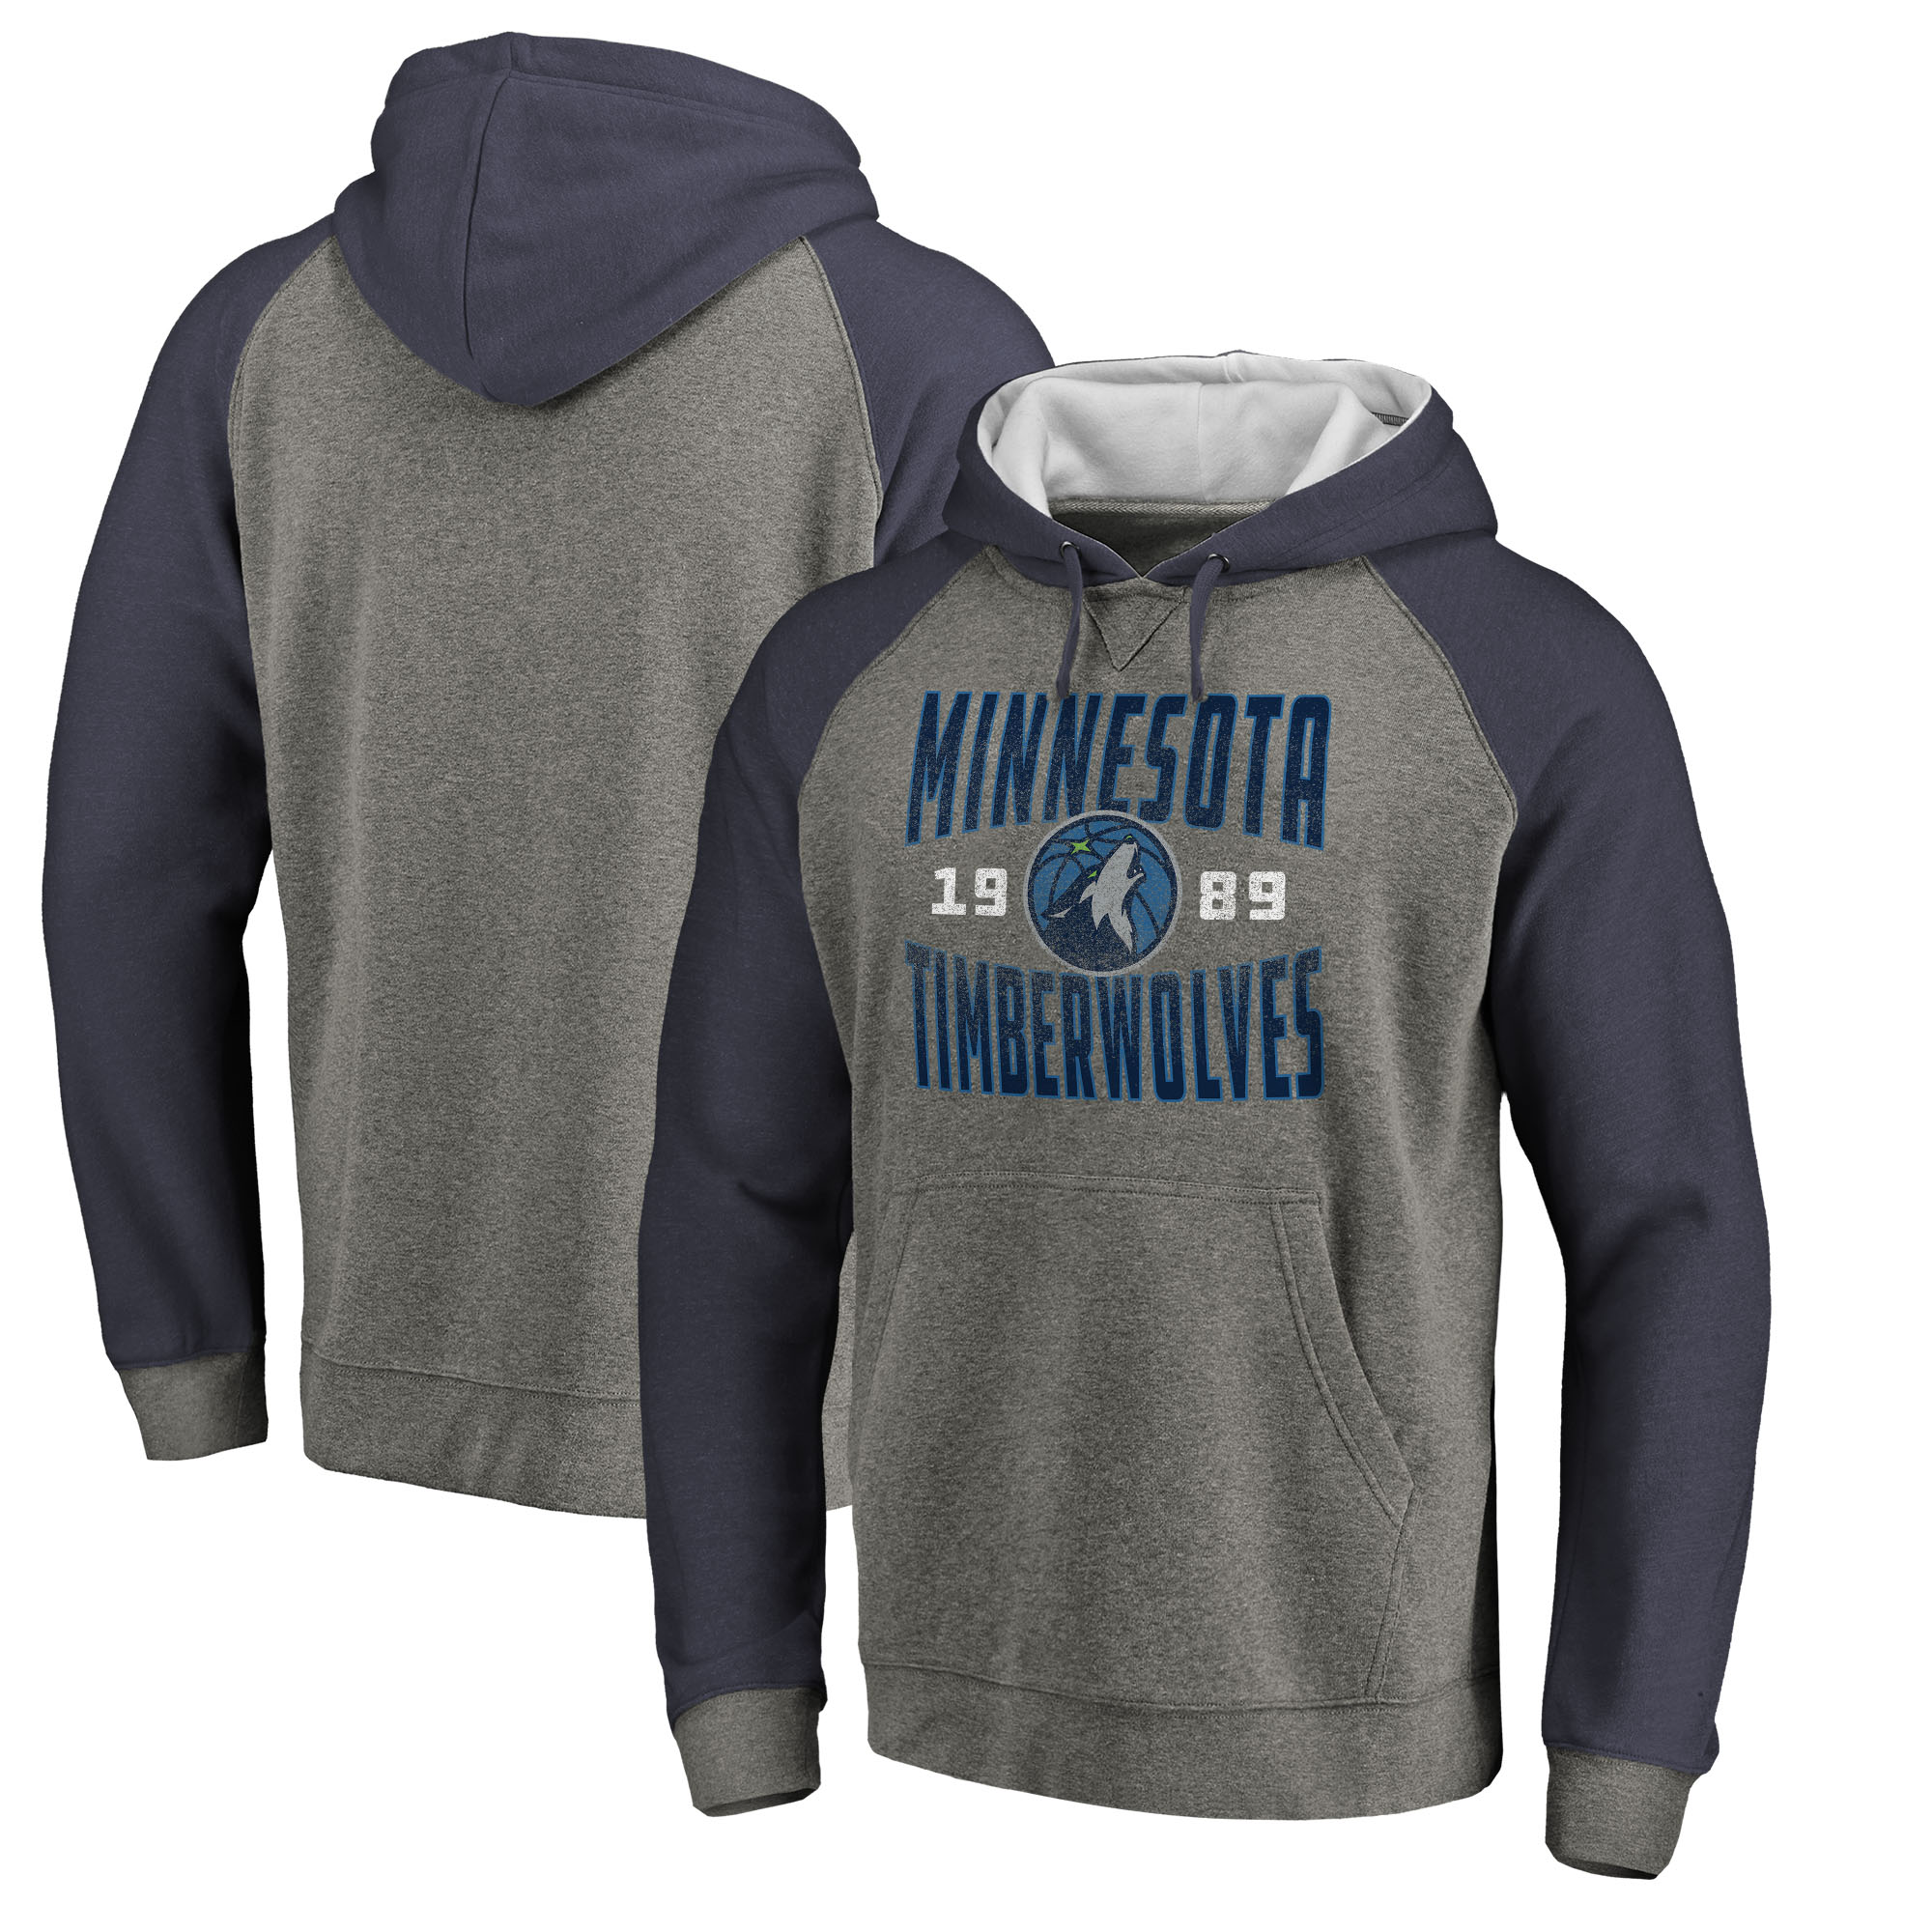 Minnesota Timberwolves Fanatics Branded Ash Antique Stack Tri-Blend Raglan Pullover Hoodie